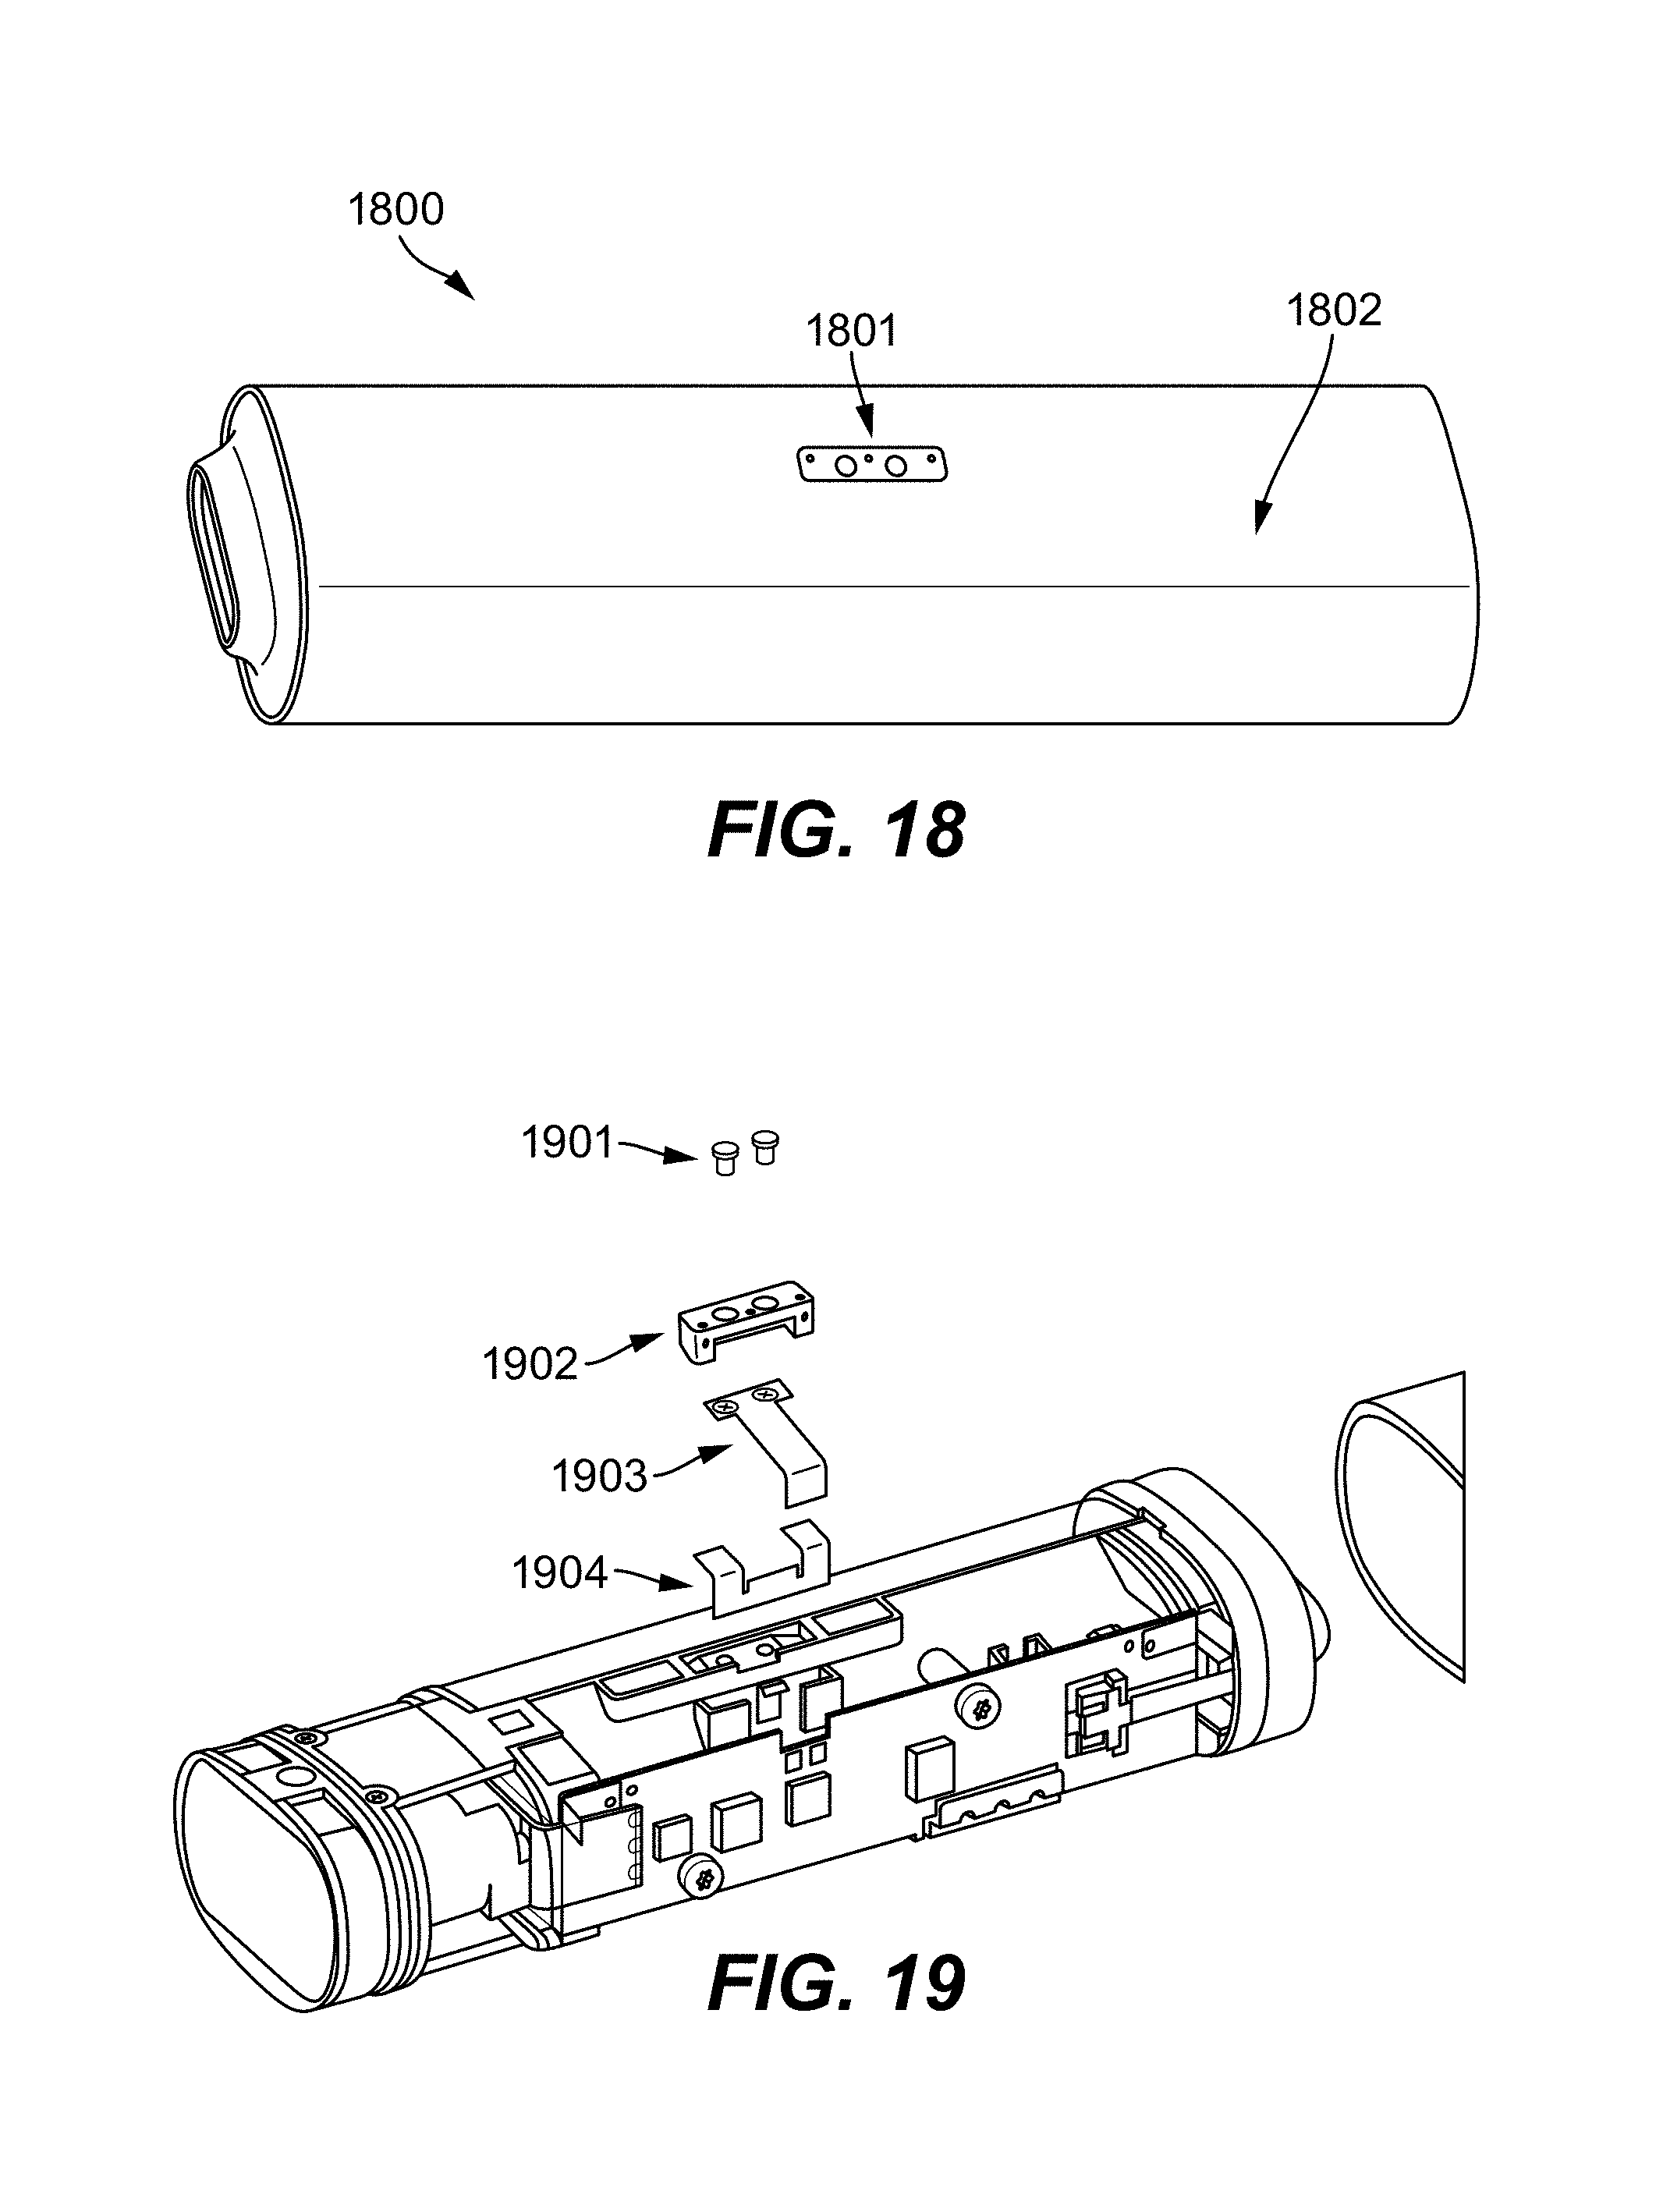 Patent US 10,045,567 B2